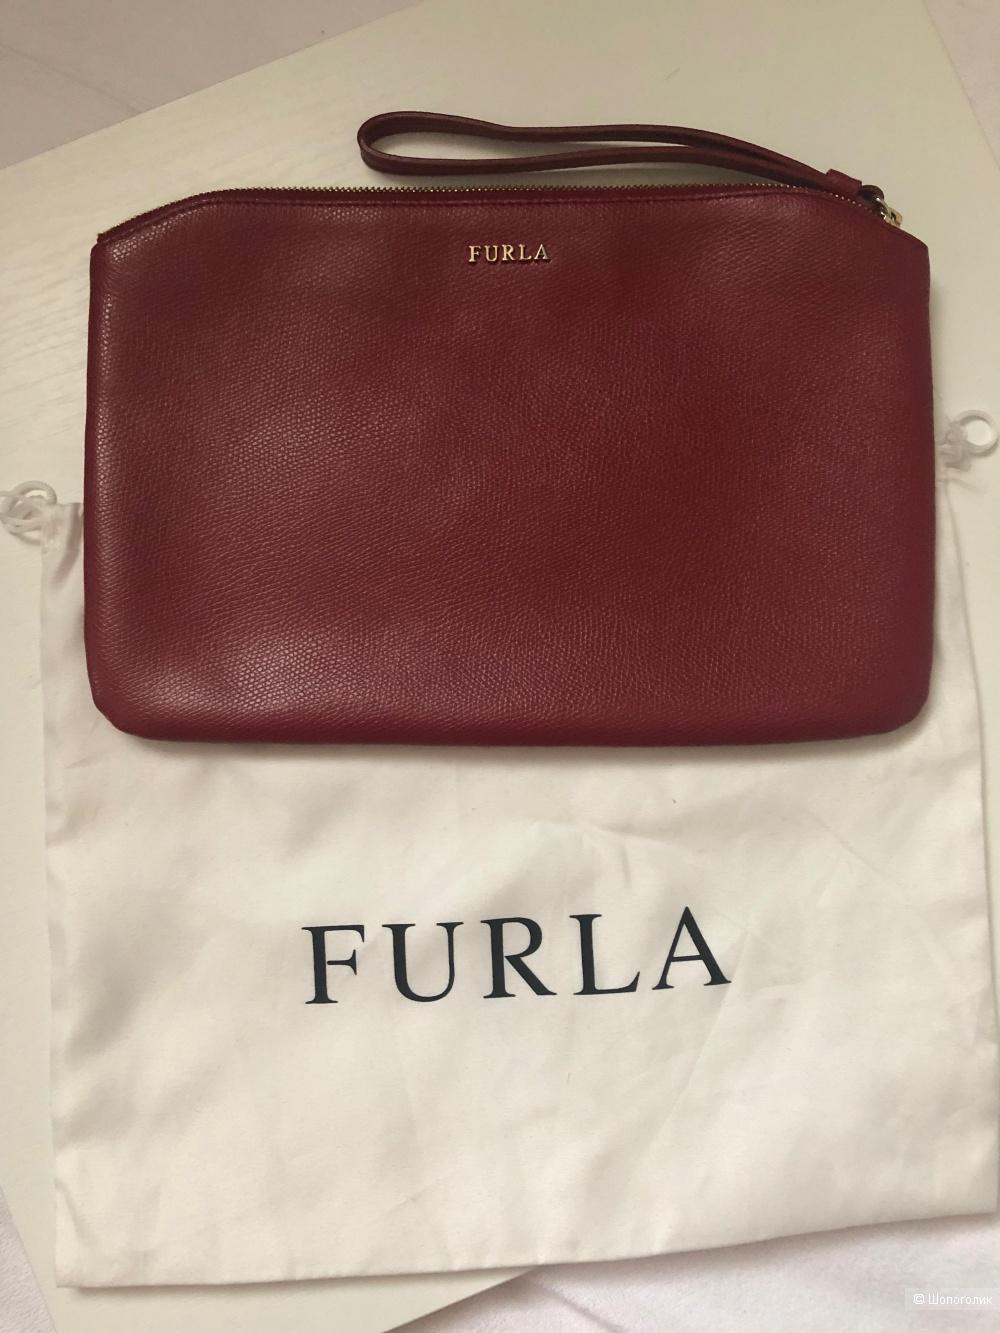 Сумка  Furla  размер М  27 см х 18 см